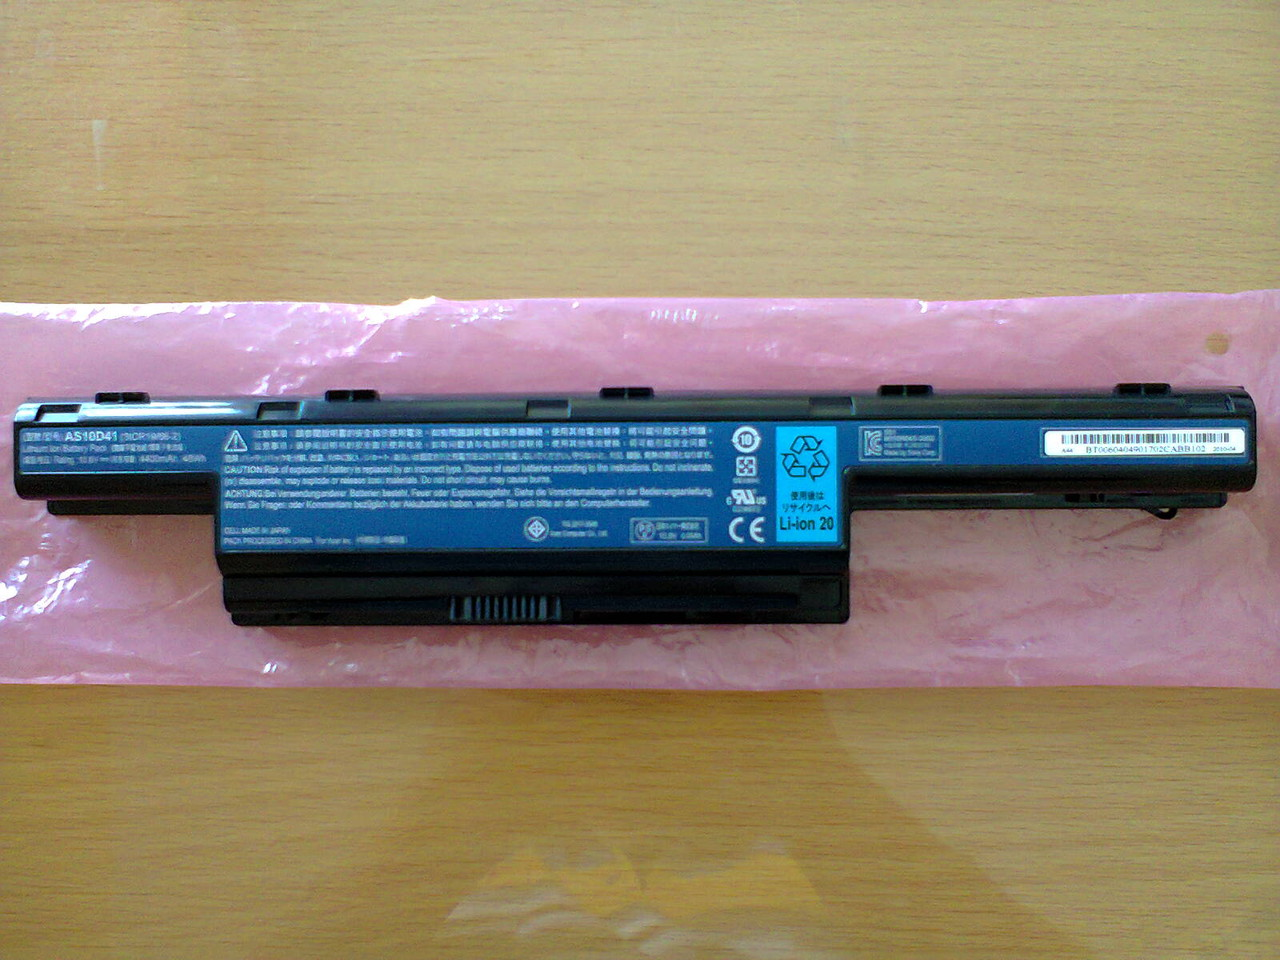 Batre Baterai Laptop Acer 4349 4738 4739z 4741 E1 421 431 4738z Battery Batrei Aspire One 4738zg 4349z 4551g Harga Original 471 451g 571